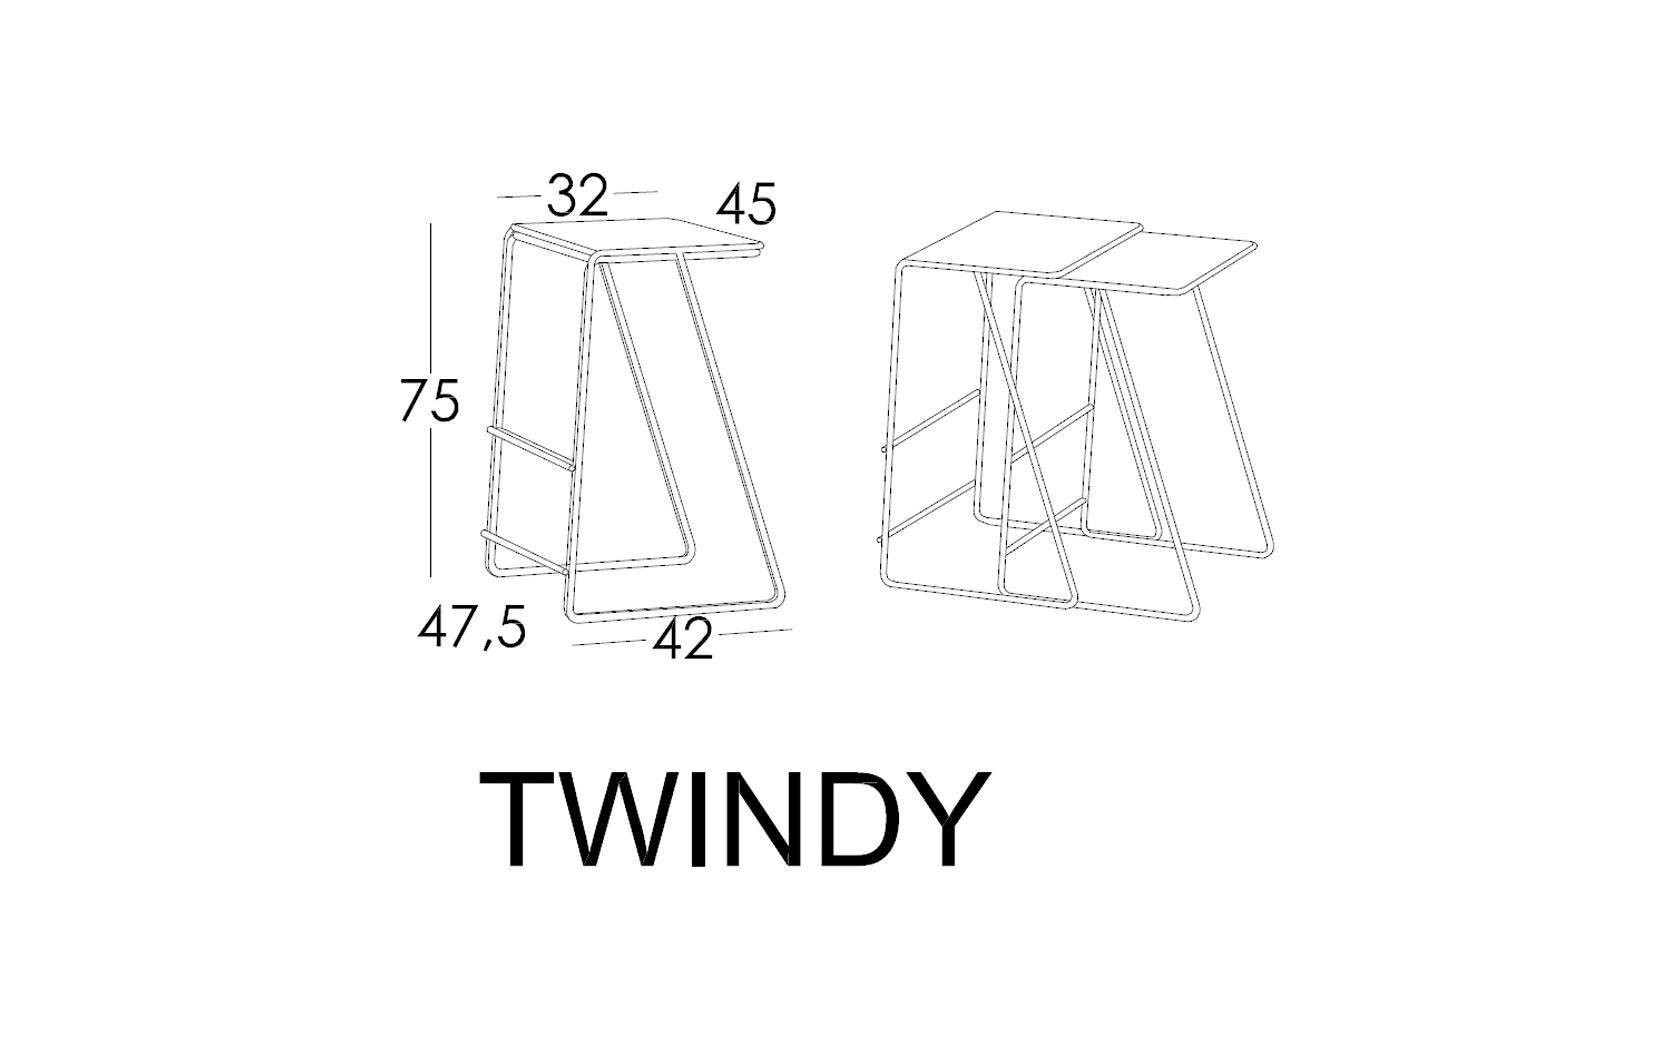 Twindy croquis alturas